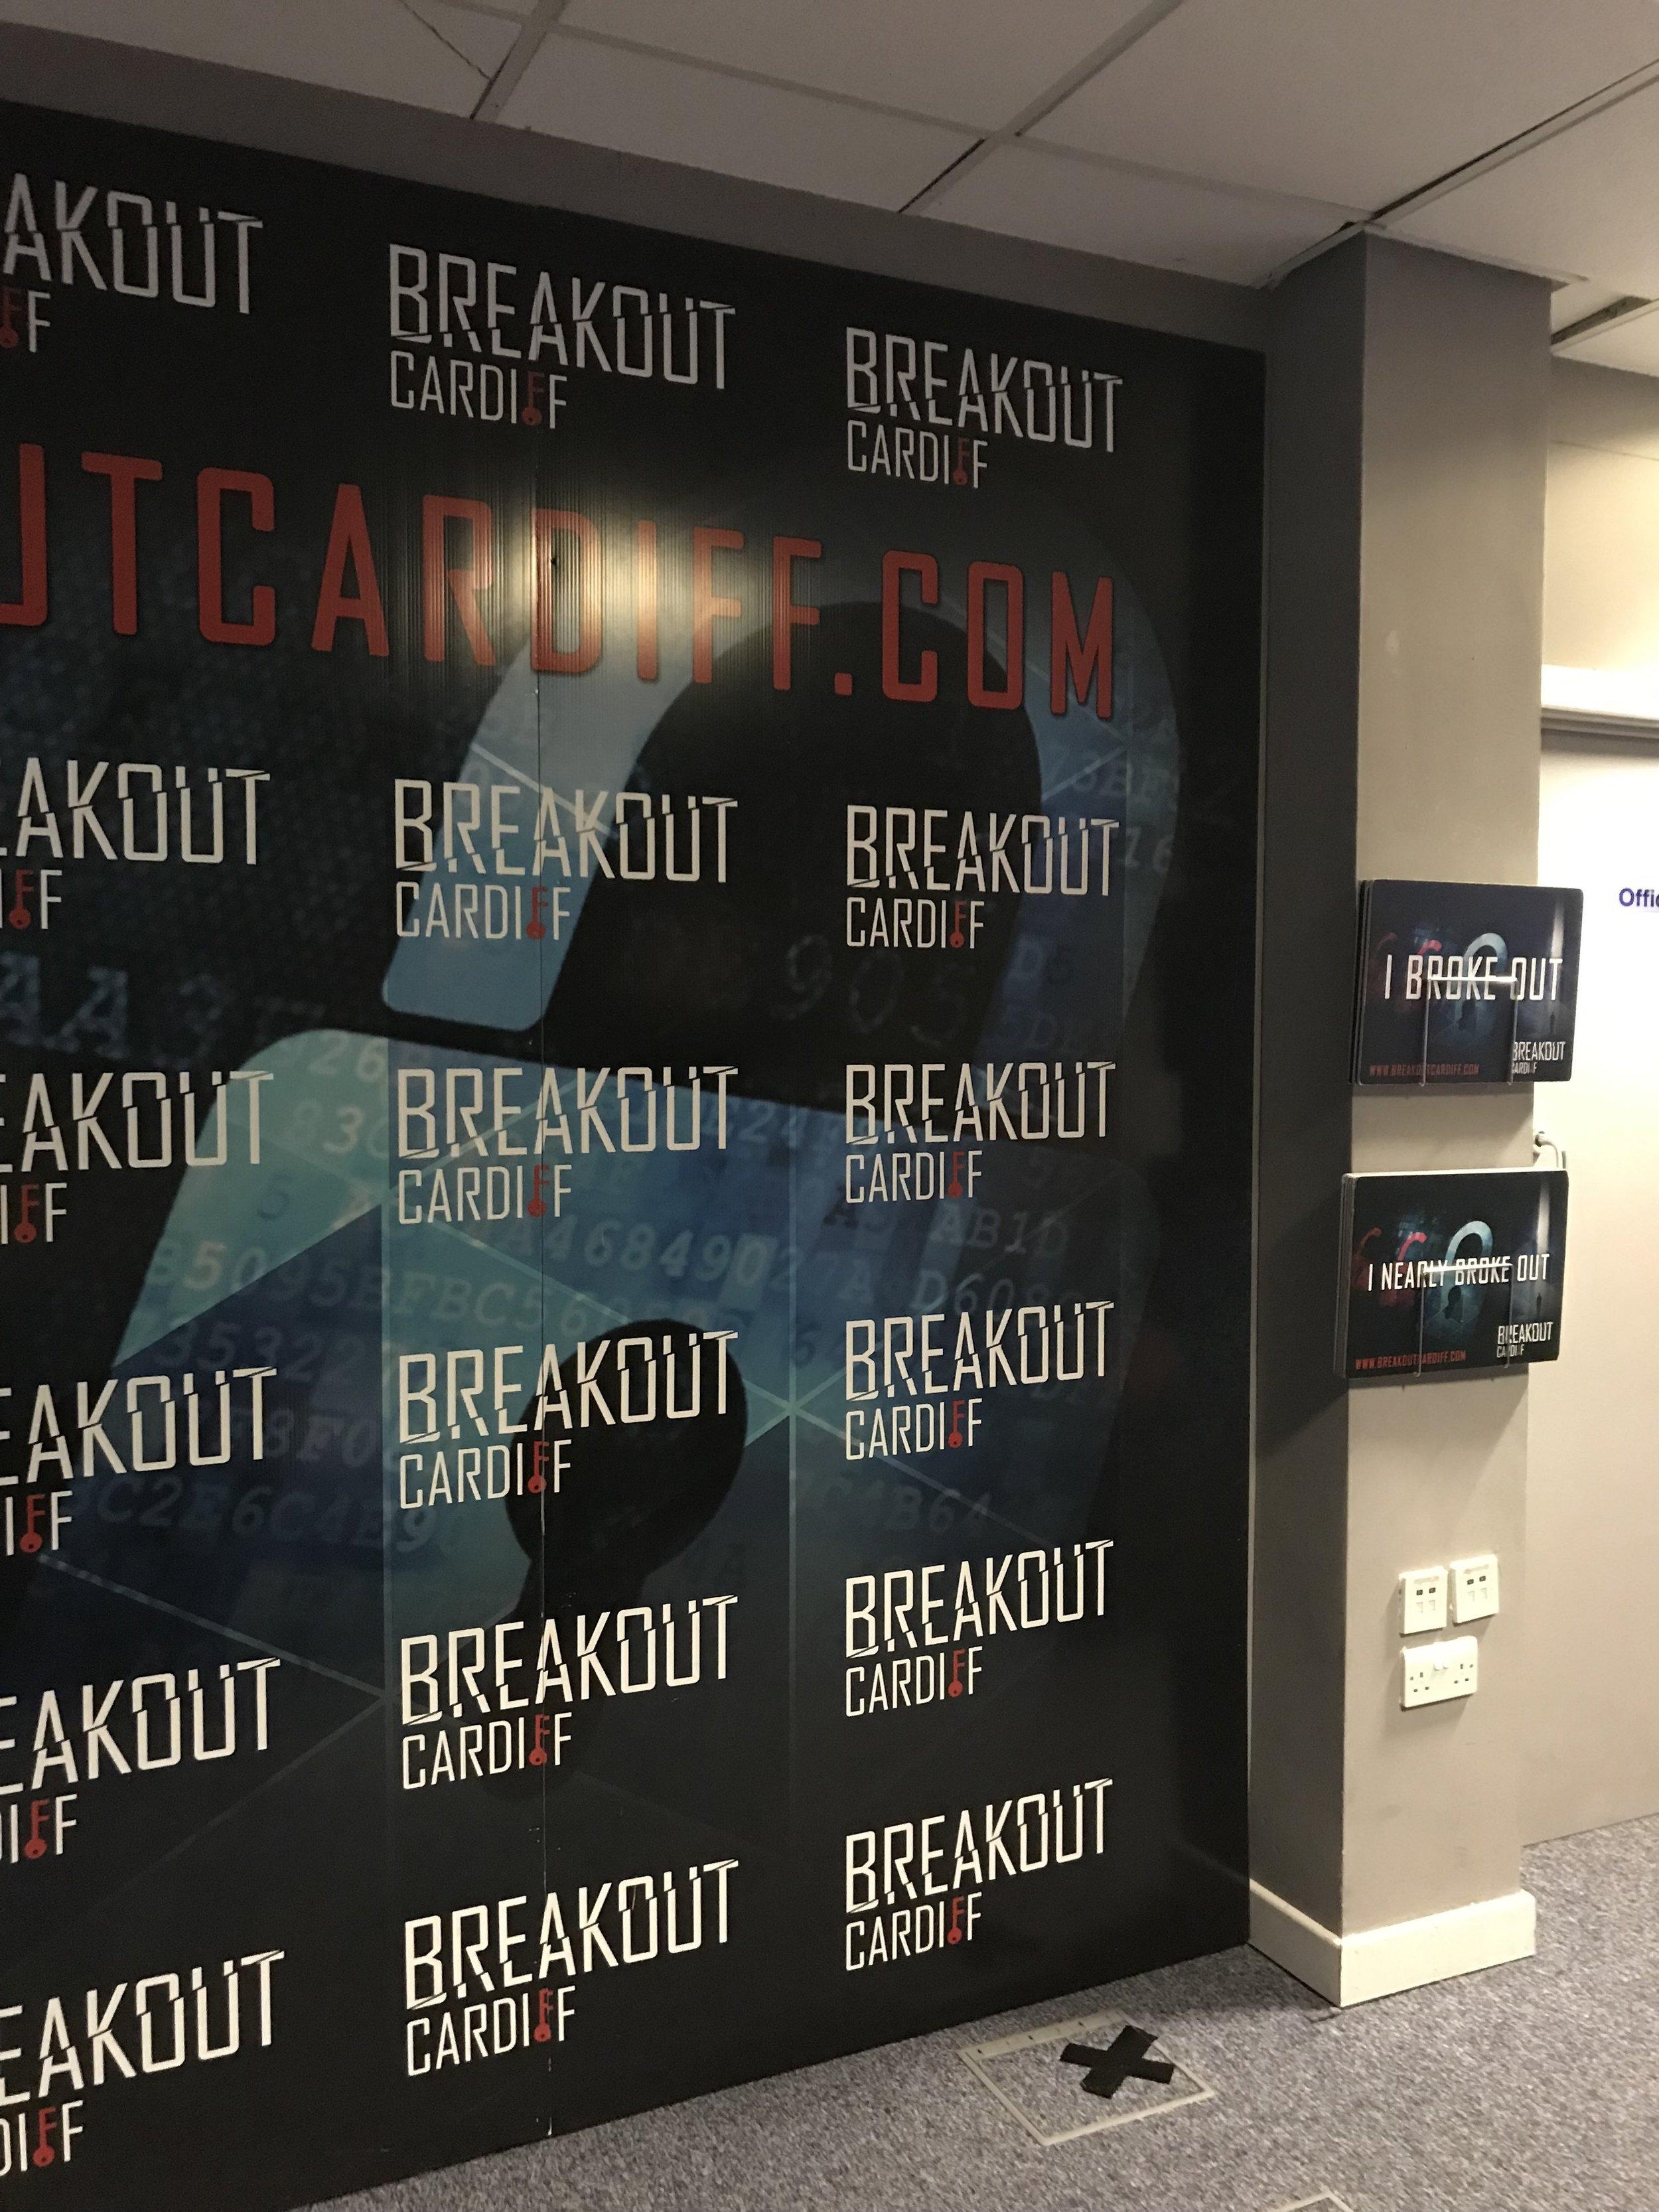 breakoutcardiff.jpg